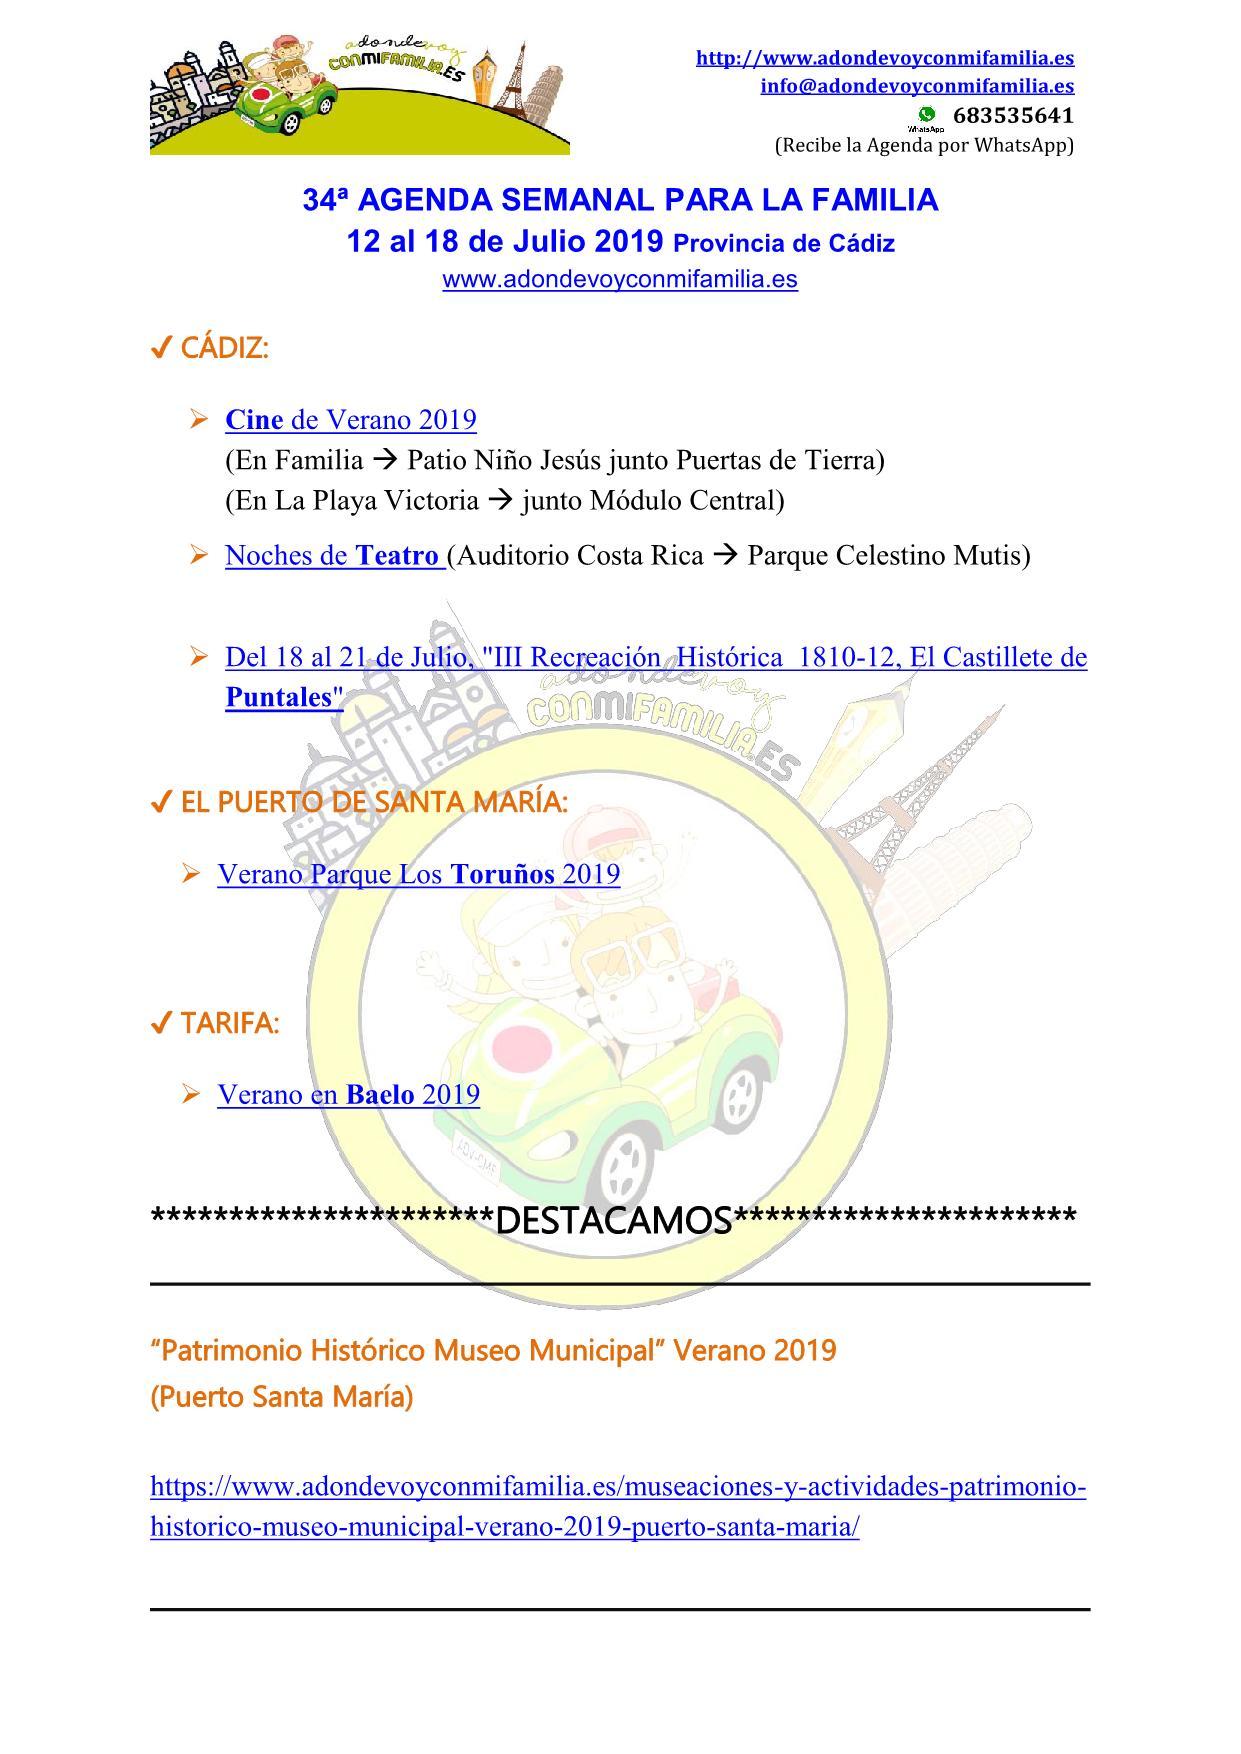 034 Agenda semanal familiar 12 al 18 Julio 2019